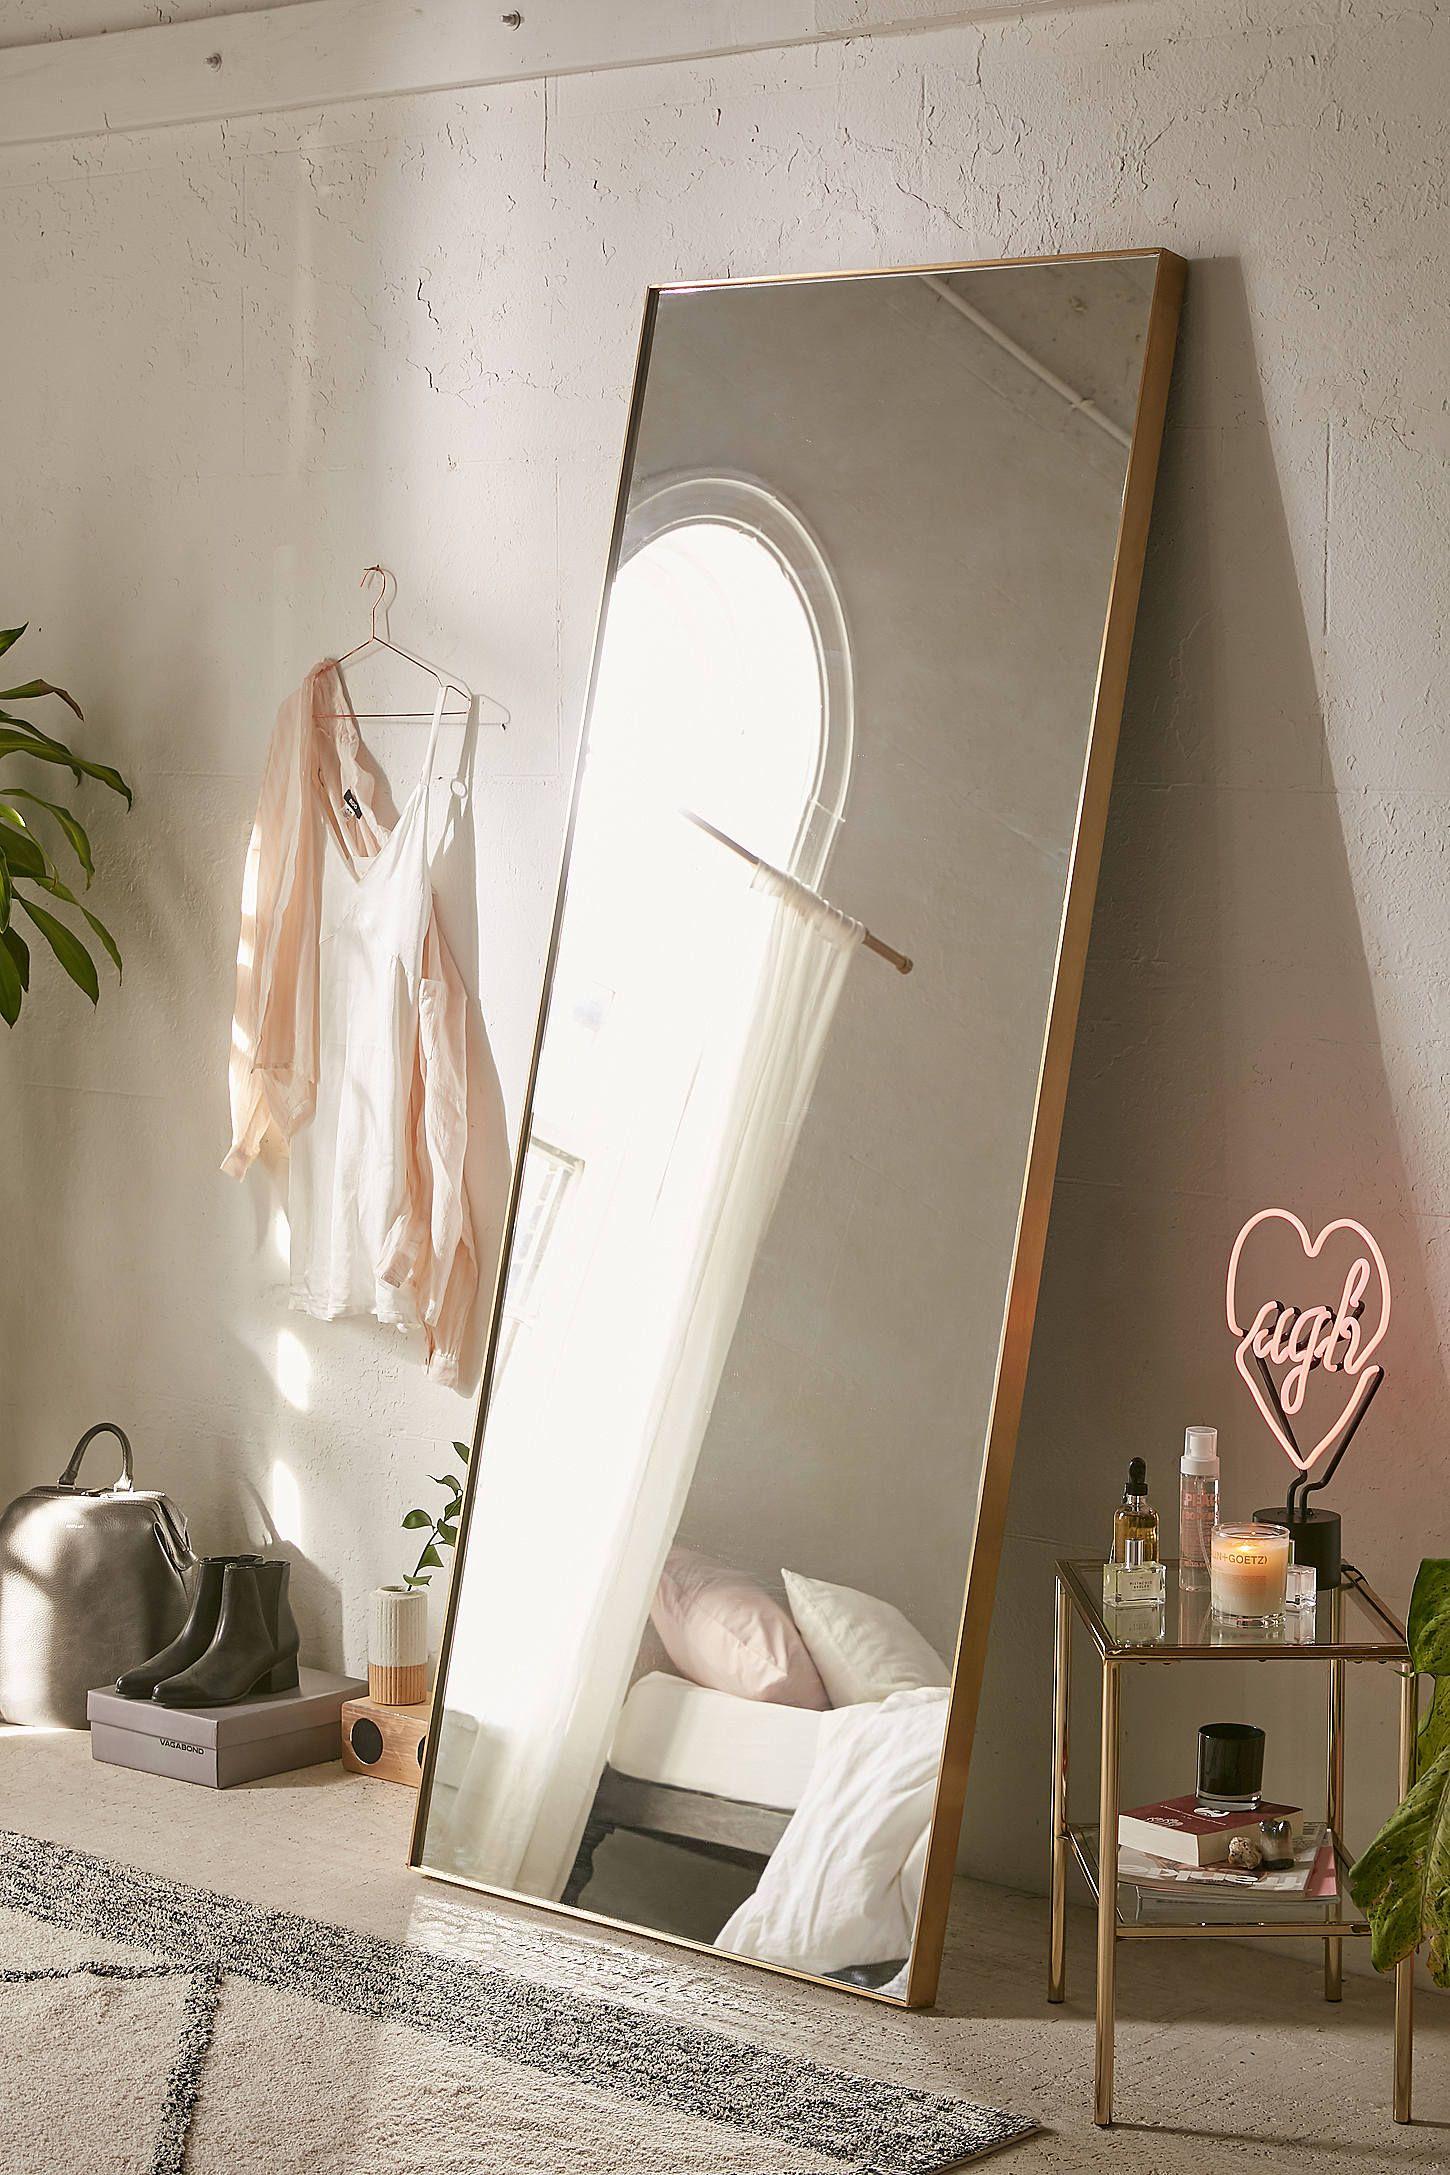 bellevue floor mirror h o m e home decor bedroom bedroom decor rh pinterest com